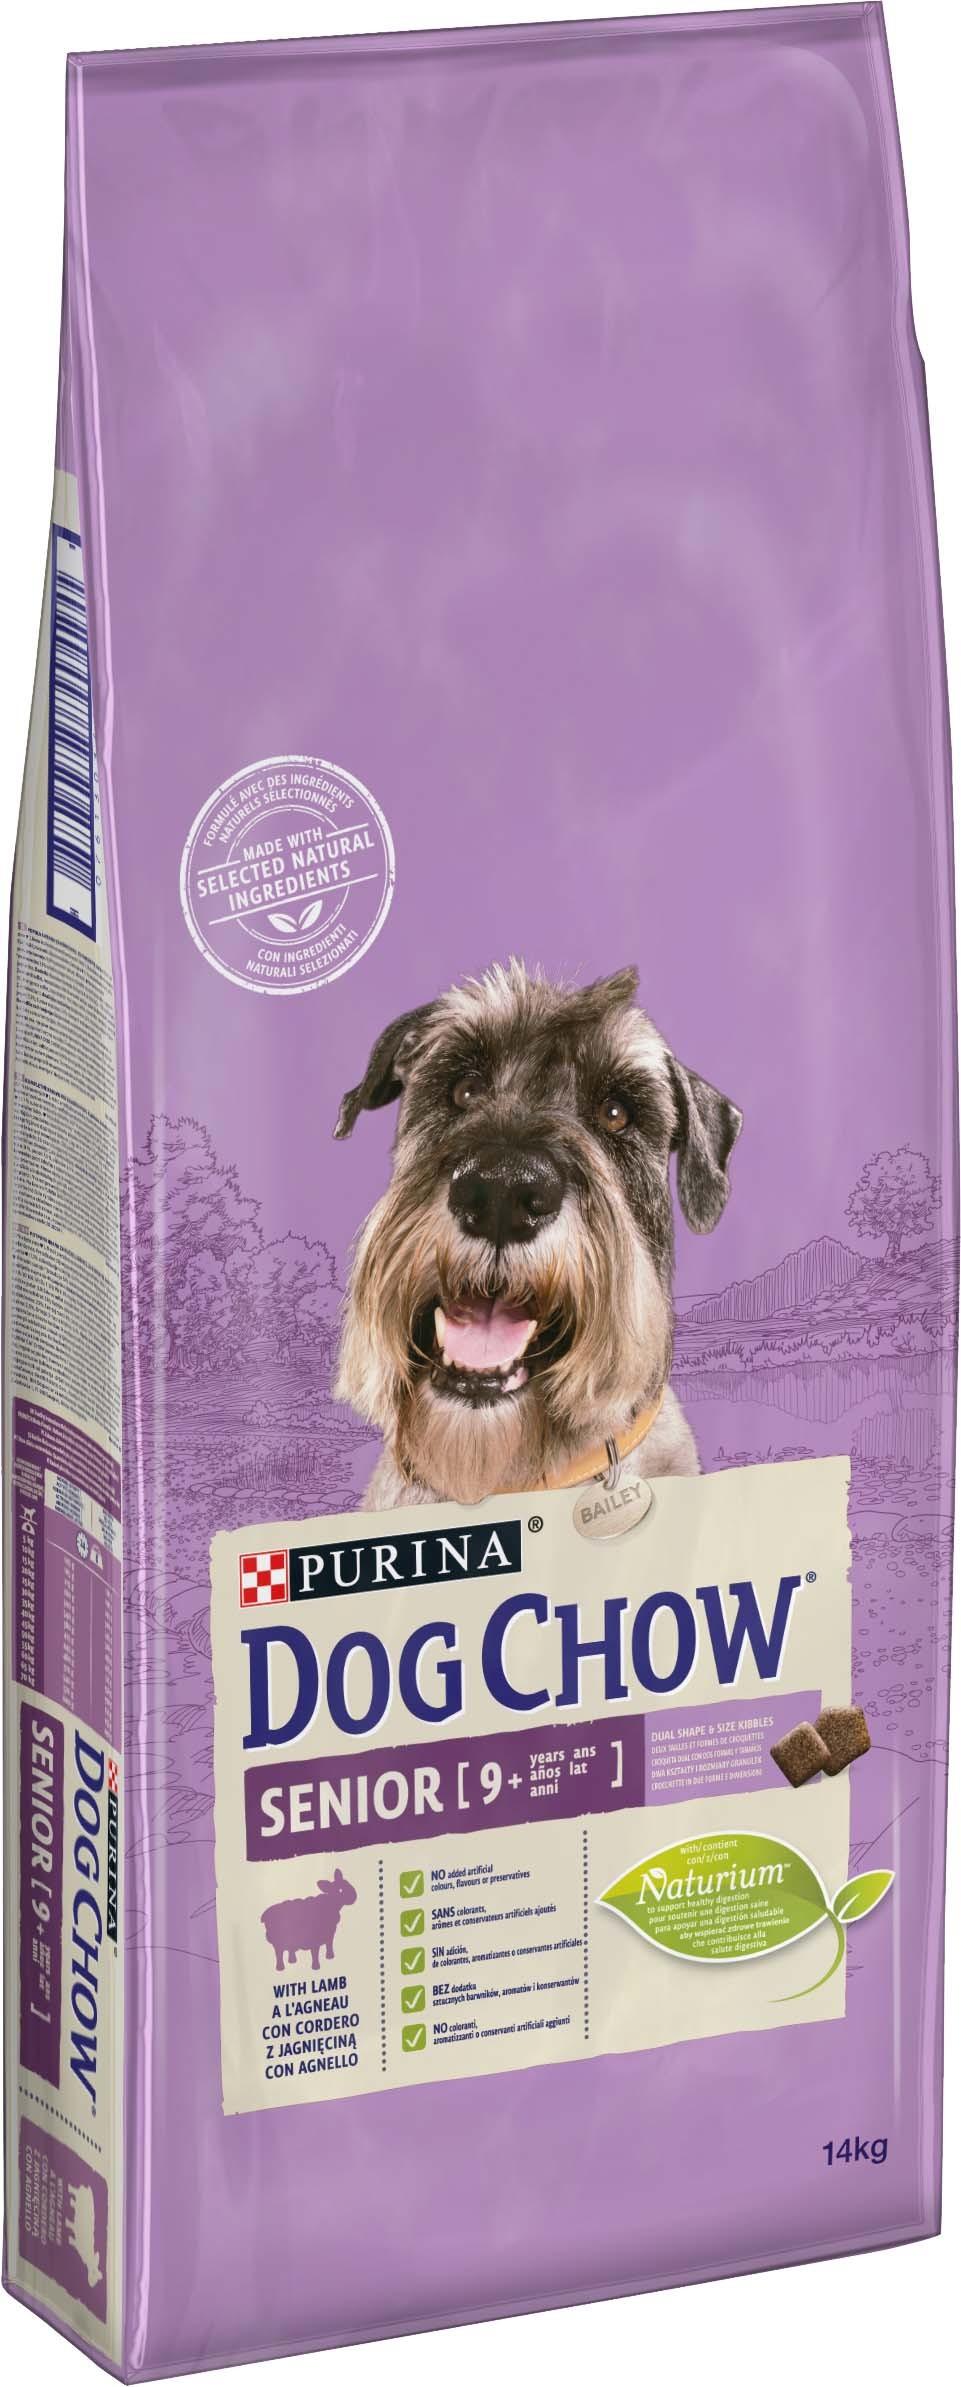 Purina dog chow senior jehněčí 14kg